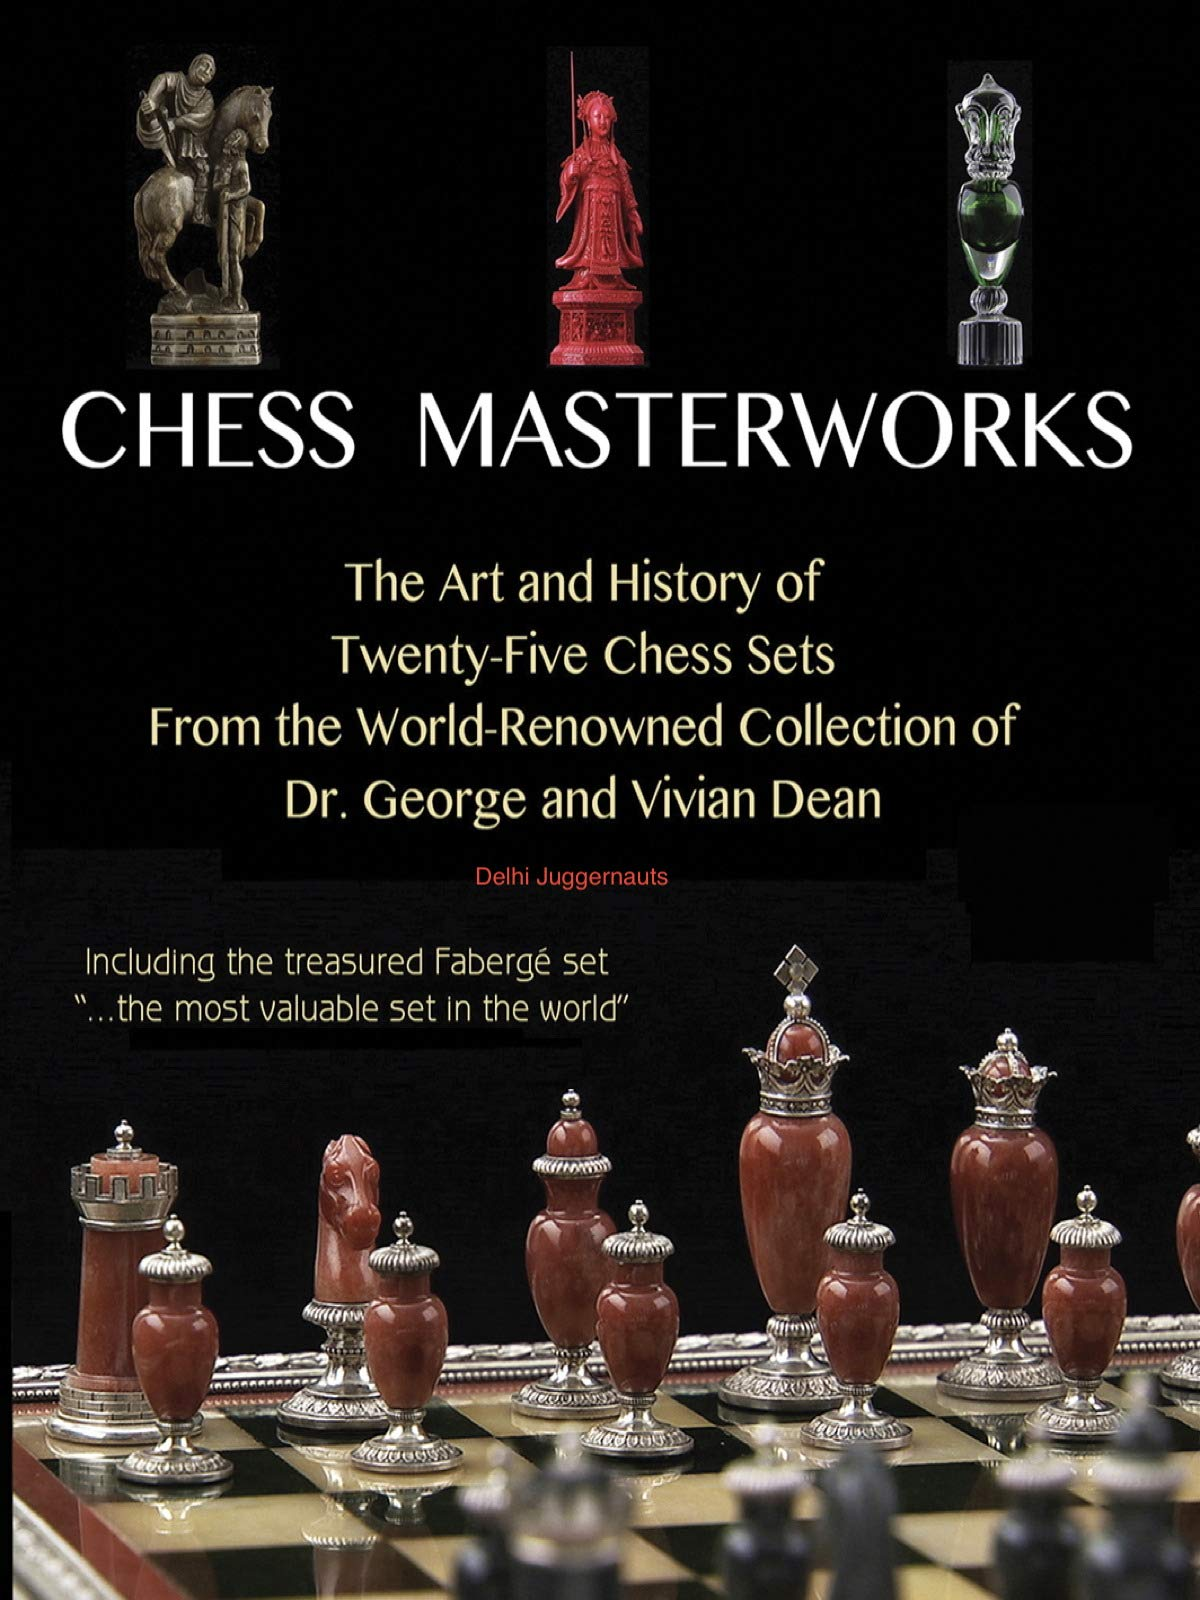 Chess Masterworks: Delhi Juggernauts on Amazon Prime Video UK